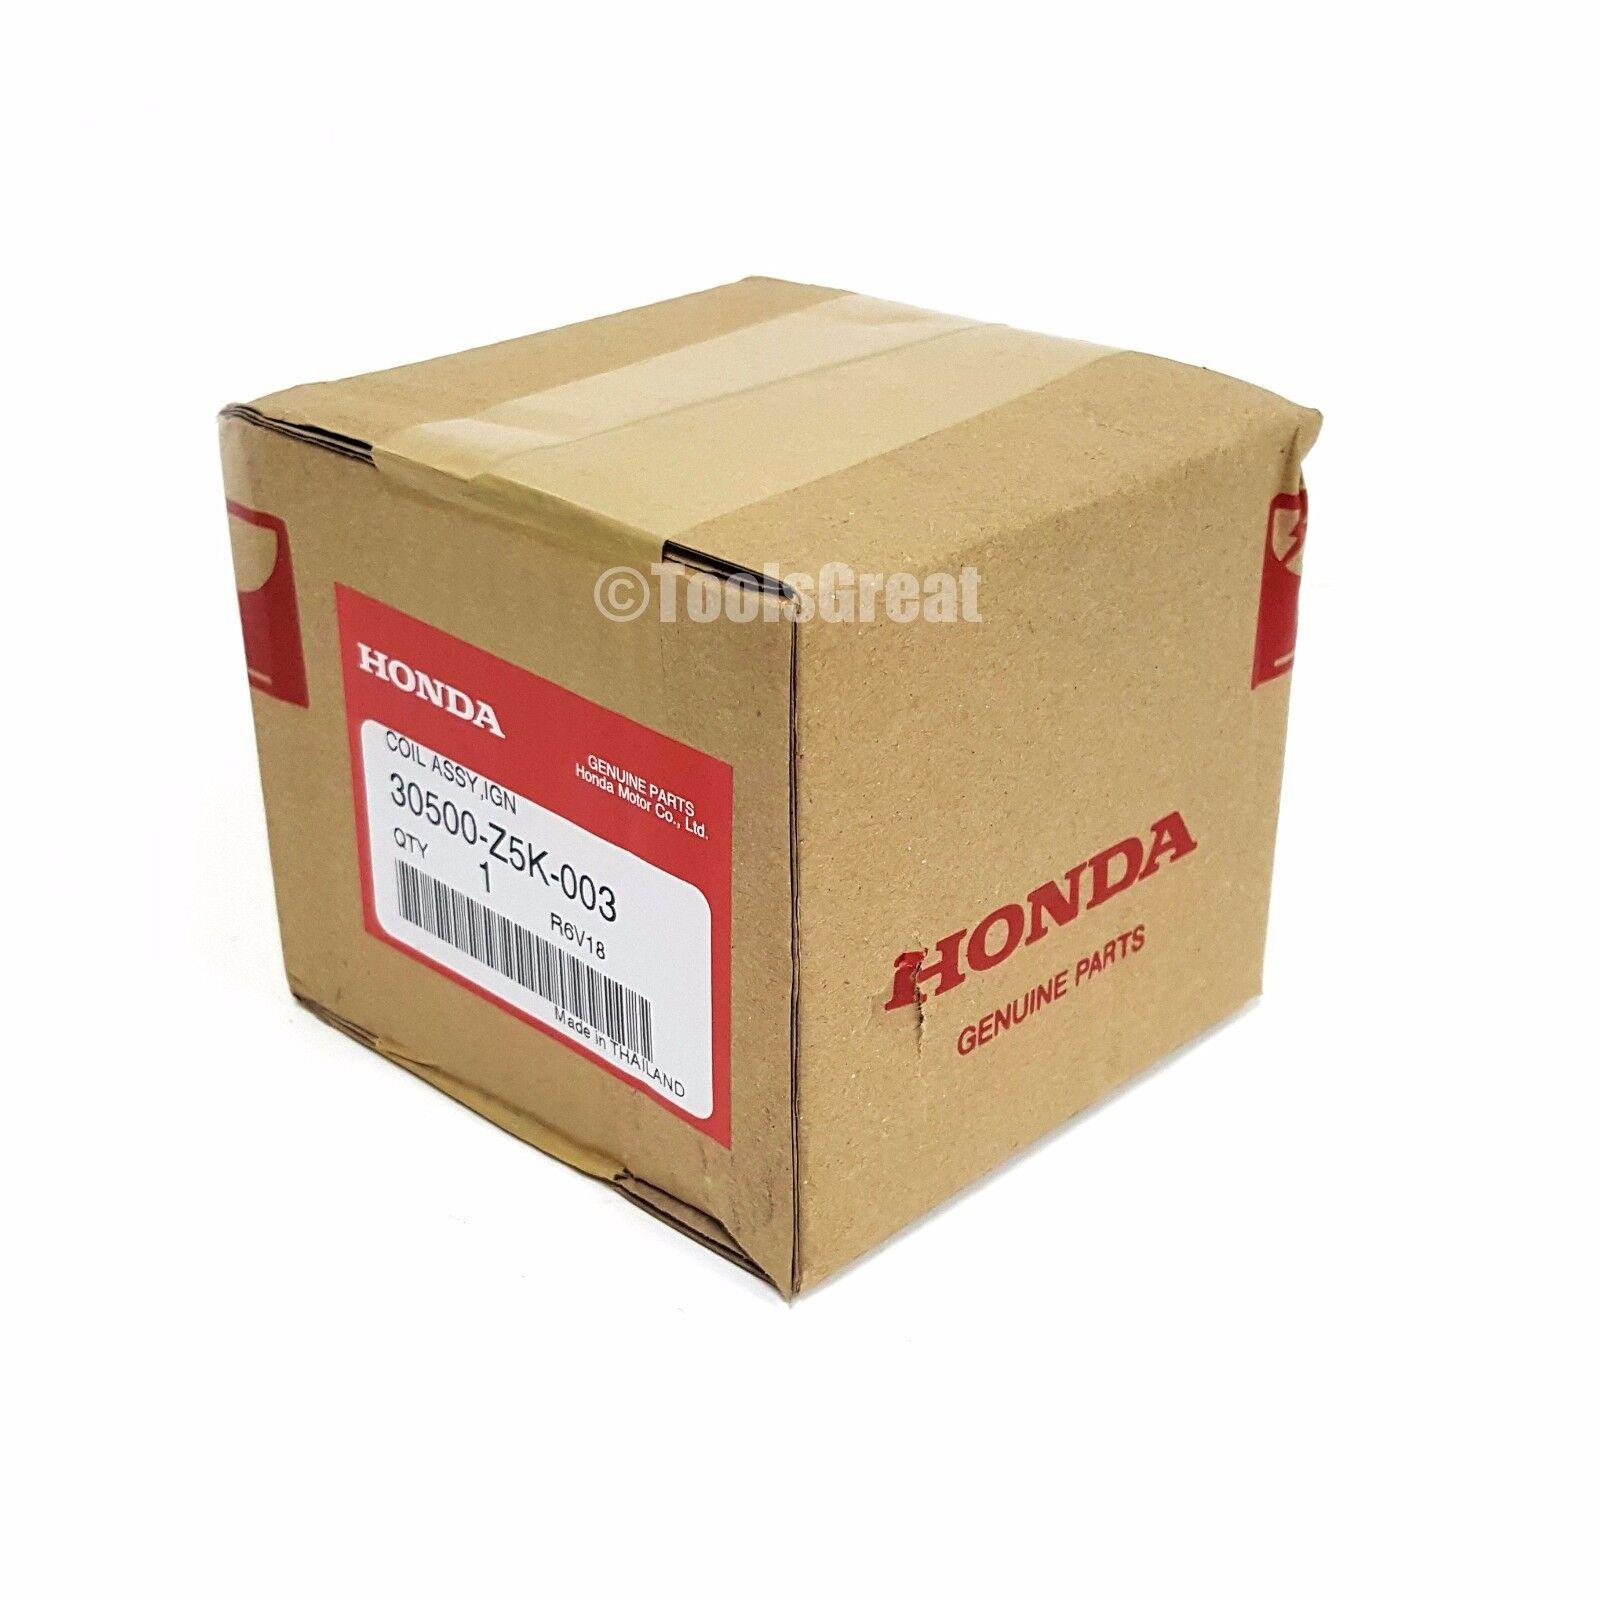 Auténtica 9hp Honda Motor GX270 ensamblaje 30500-Z5K-003 Bobina De Encendido